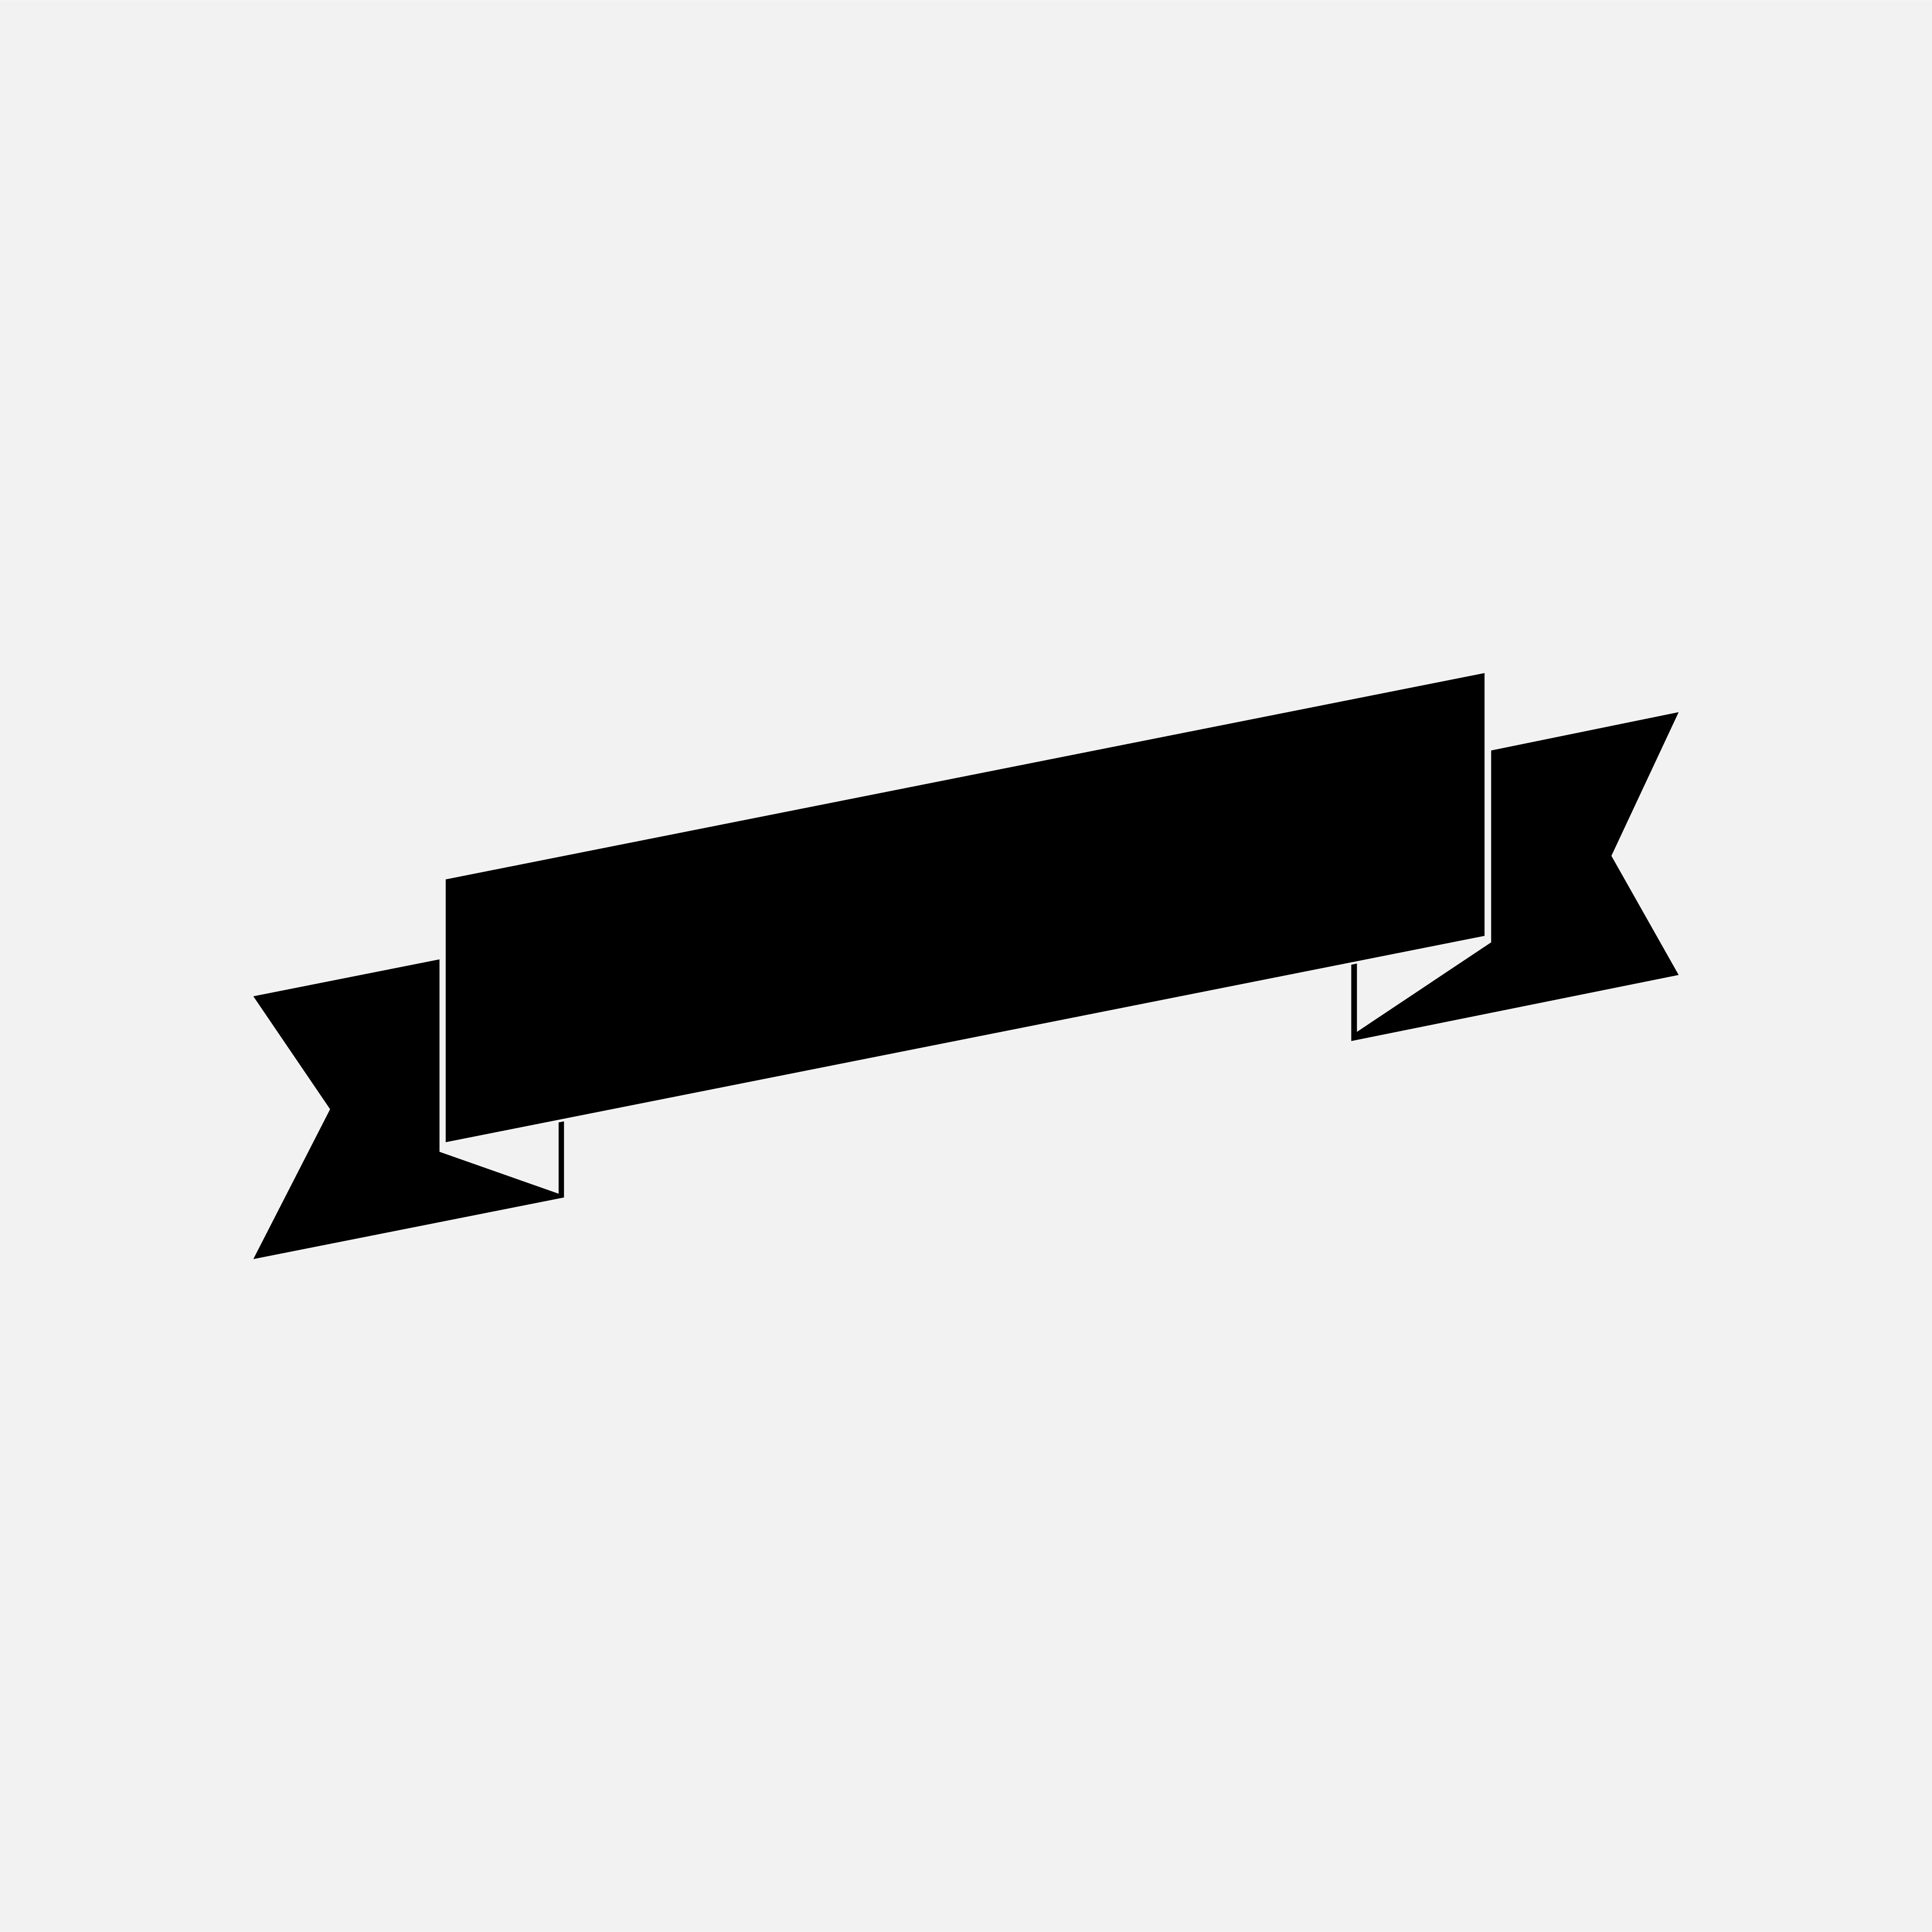 Blank black ribbon banner vector - Download Free Vectors ...